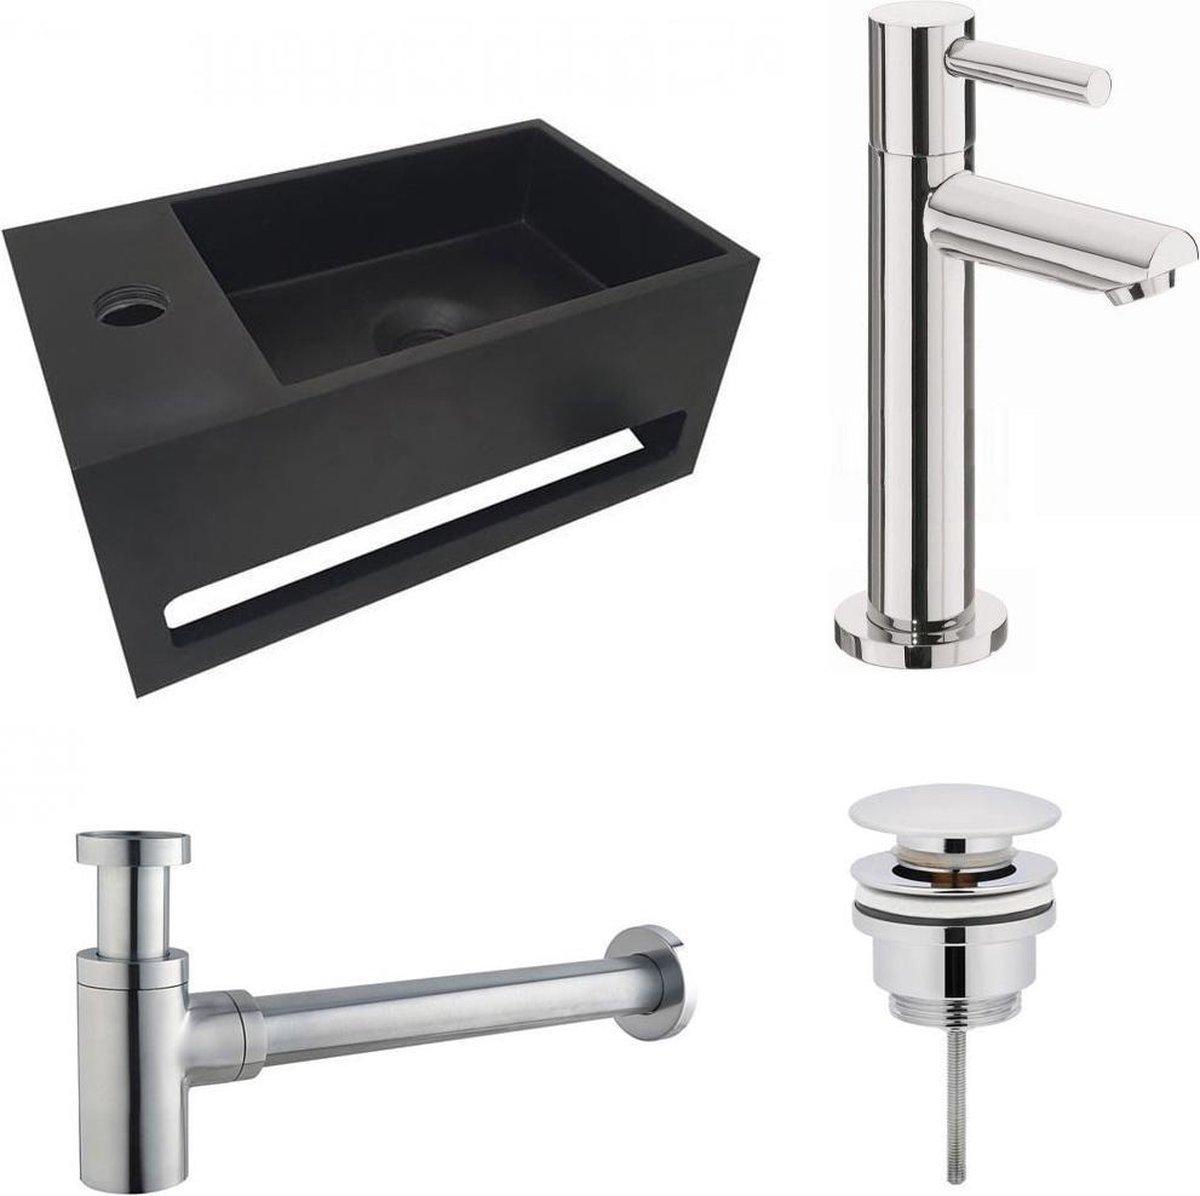 Fonteinset S.S. Solid Surface Mat Zwart Links 35.6x20.3x15.9cm Toiletkraan Hendel Clickwaste Sifon Chroom